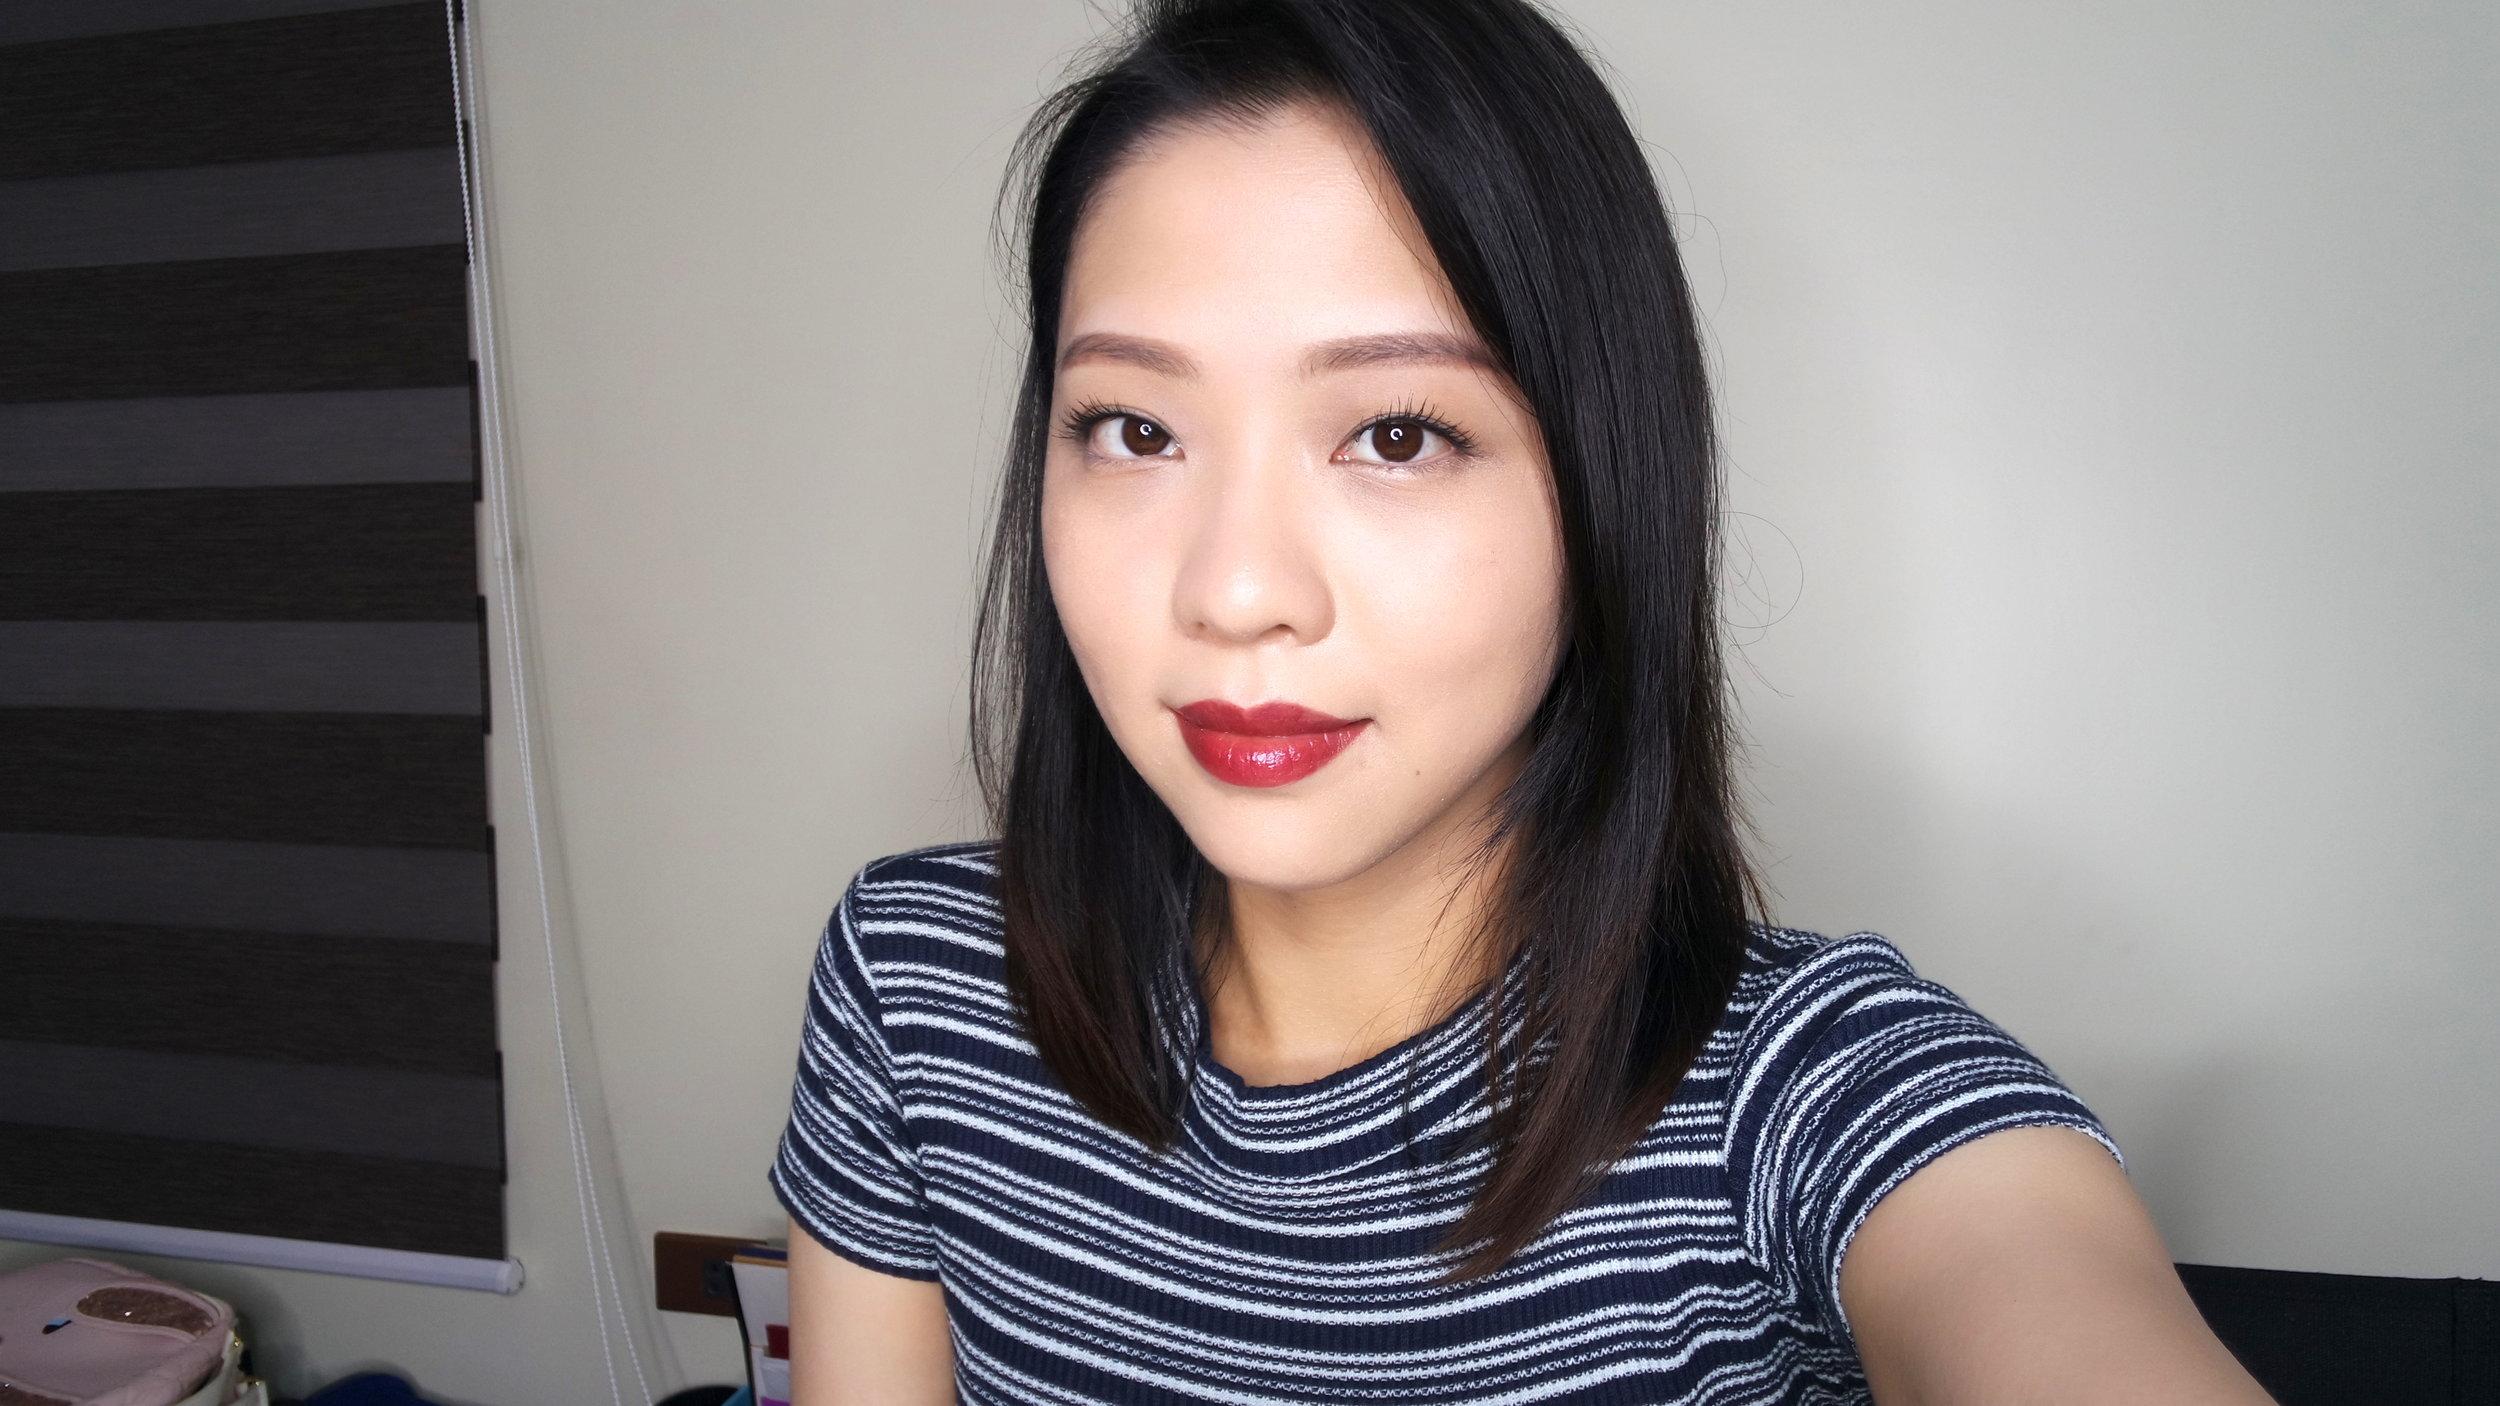 elizabeth arden ultra ceramide lipstick 24 cassis